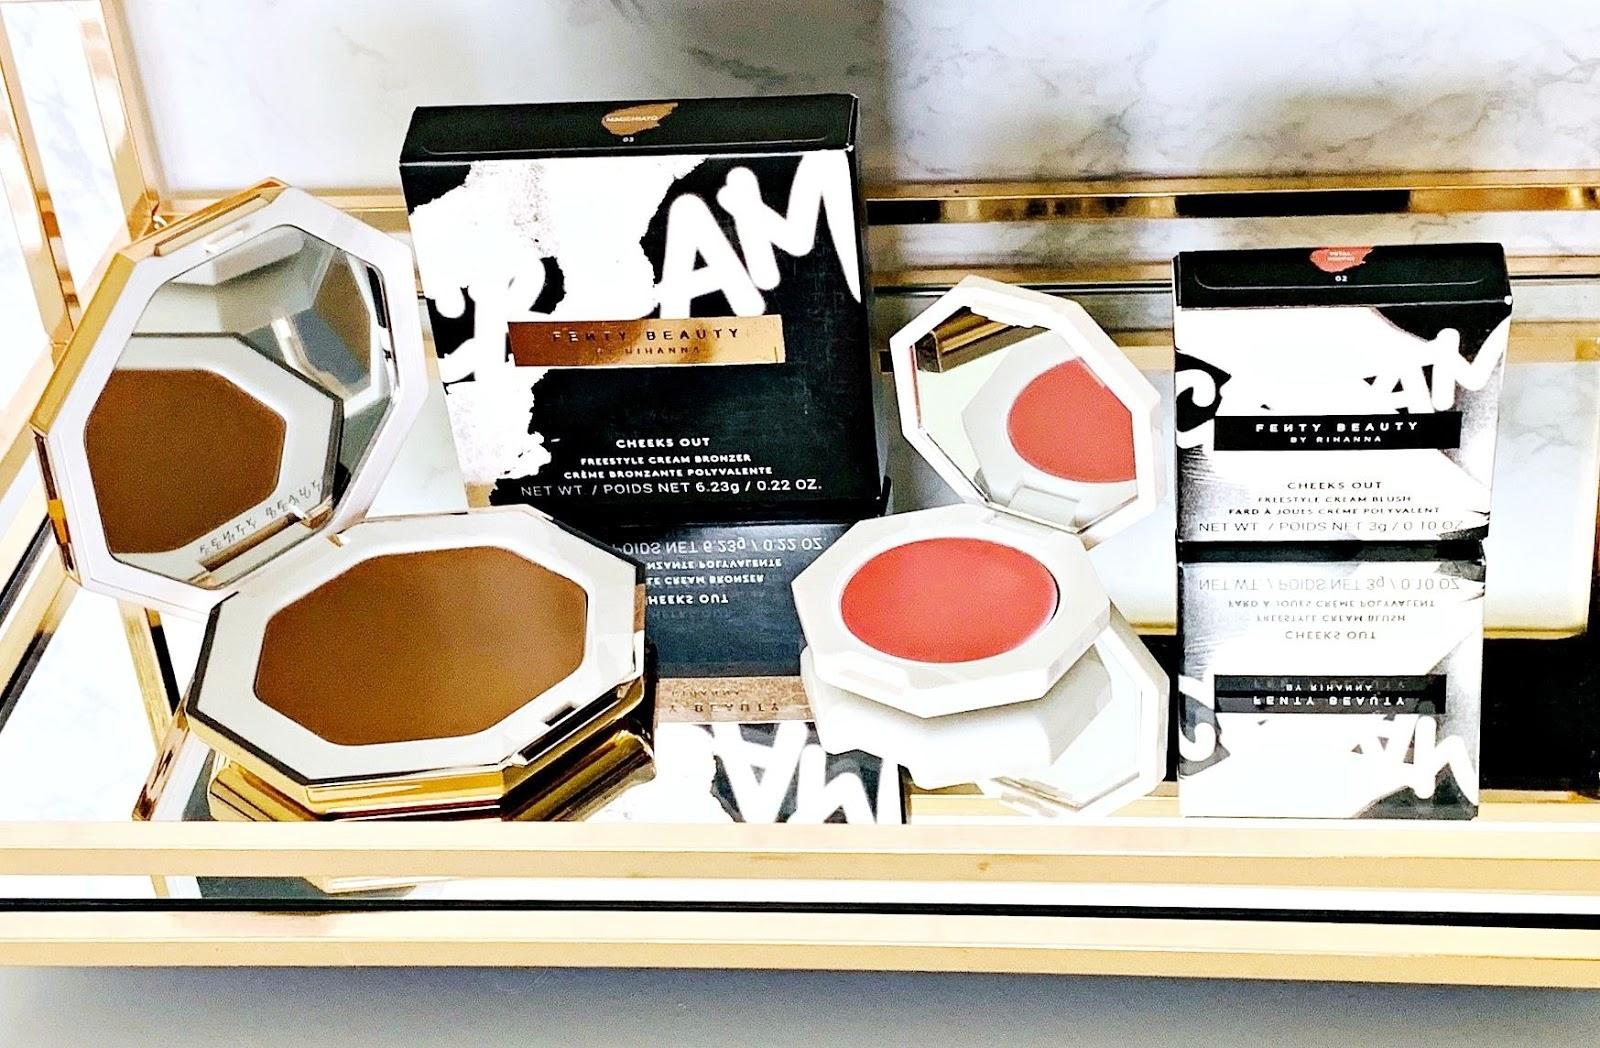 Fenty Beauty cream cheek products - worth the hype?